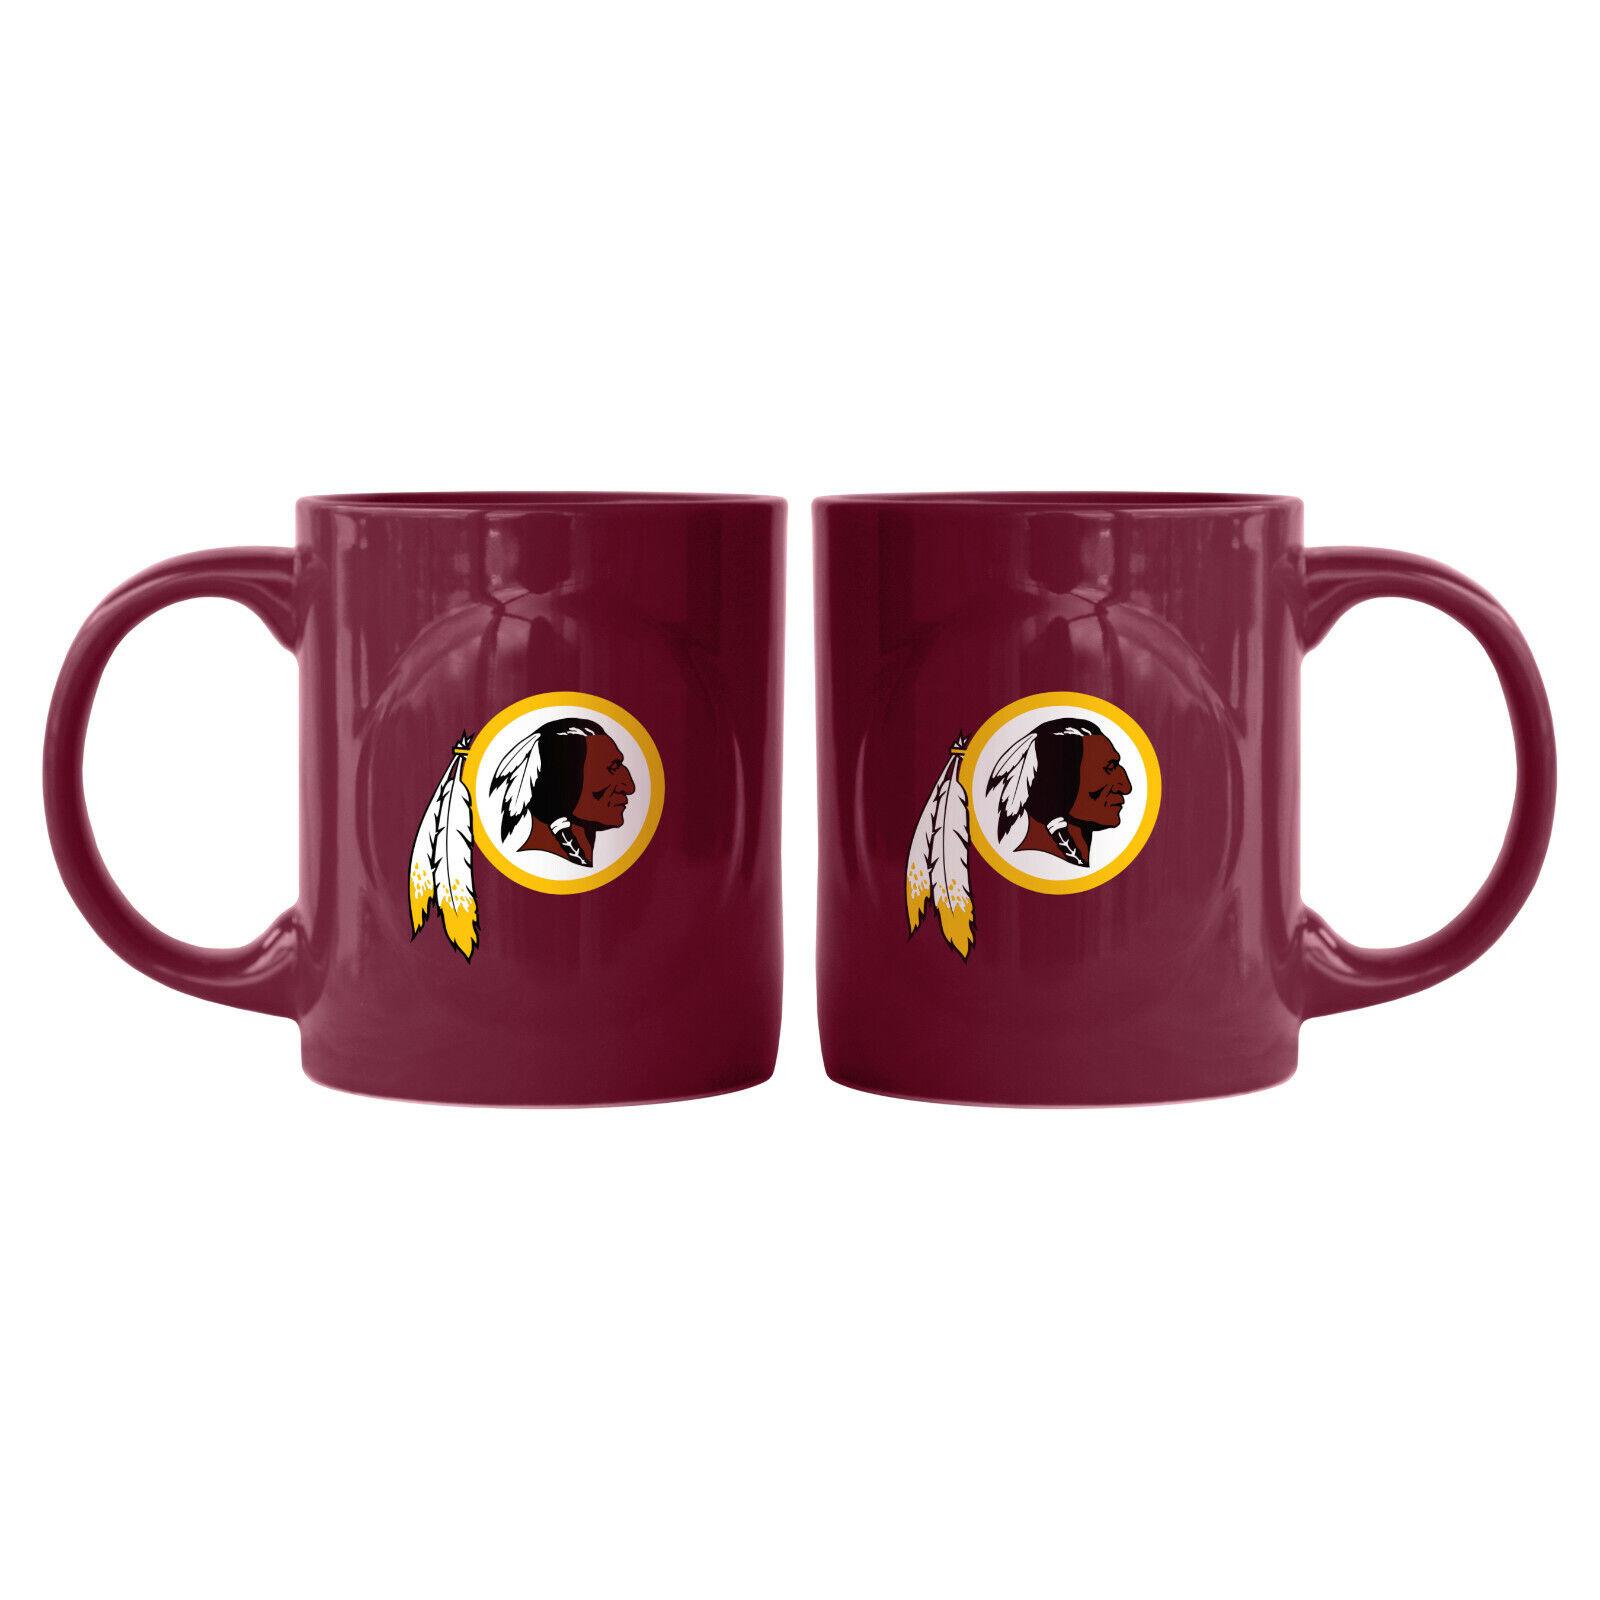 NFL Kaffeetasse Washington Redskins Rally Becher Tasse Coffee Tea Mug Football